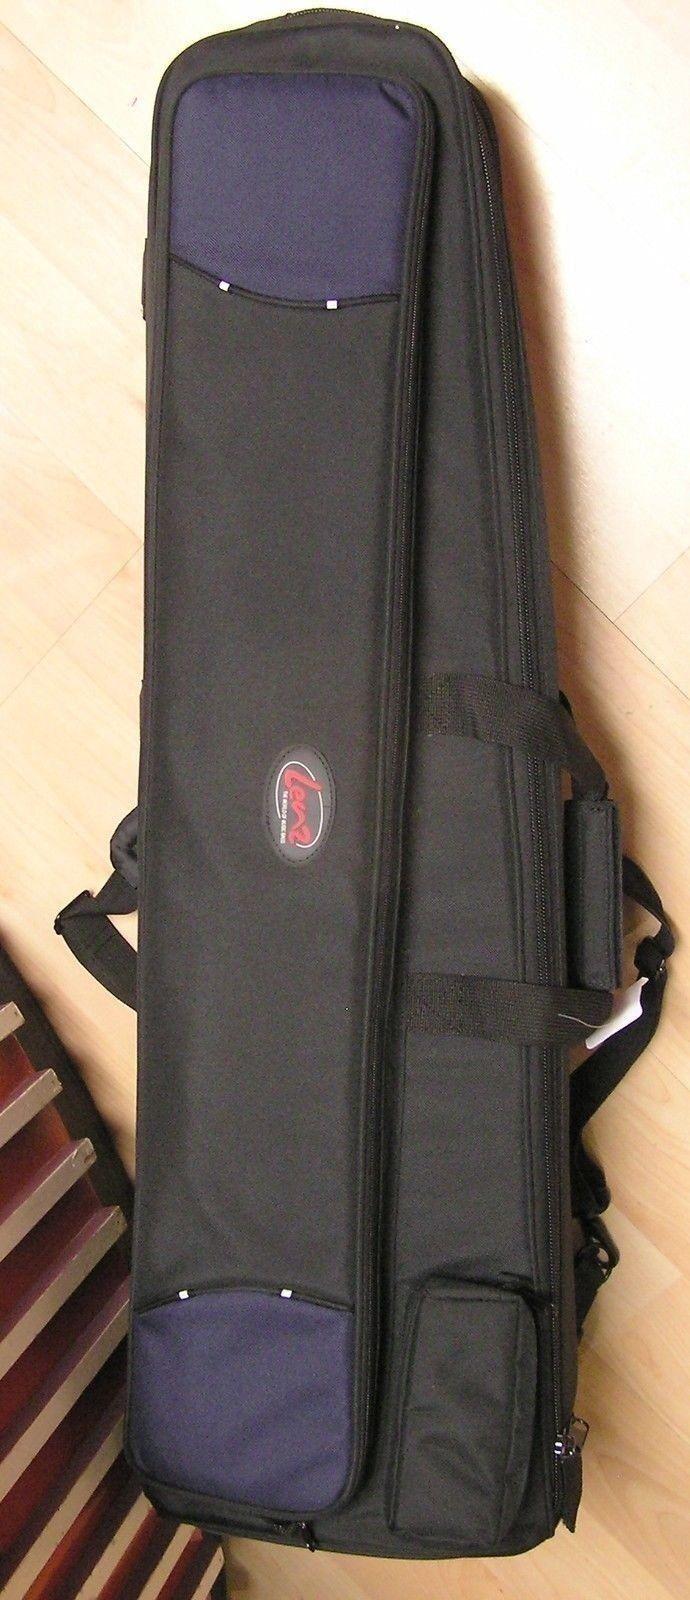 Gig-Bag Tasche für Posaune, Quartposaune, Fabrikat  Lenz, Modell  FMB-BTB, 27cm